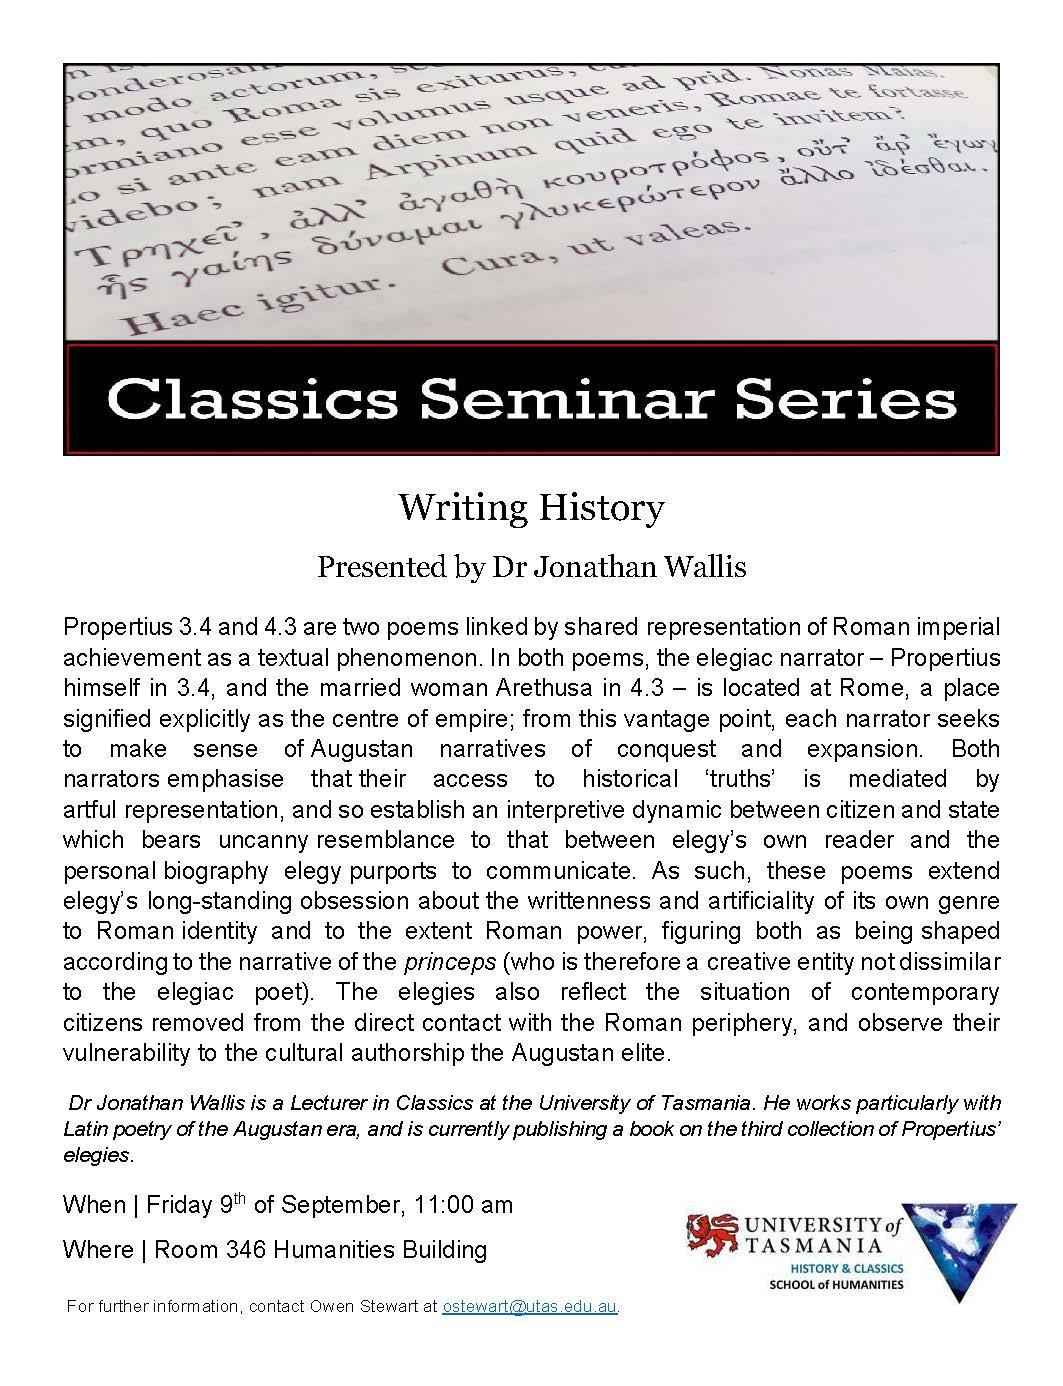 Classics Seminar 9 Sep